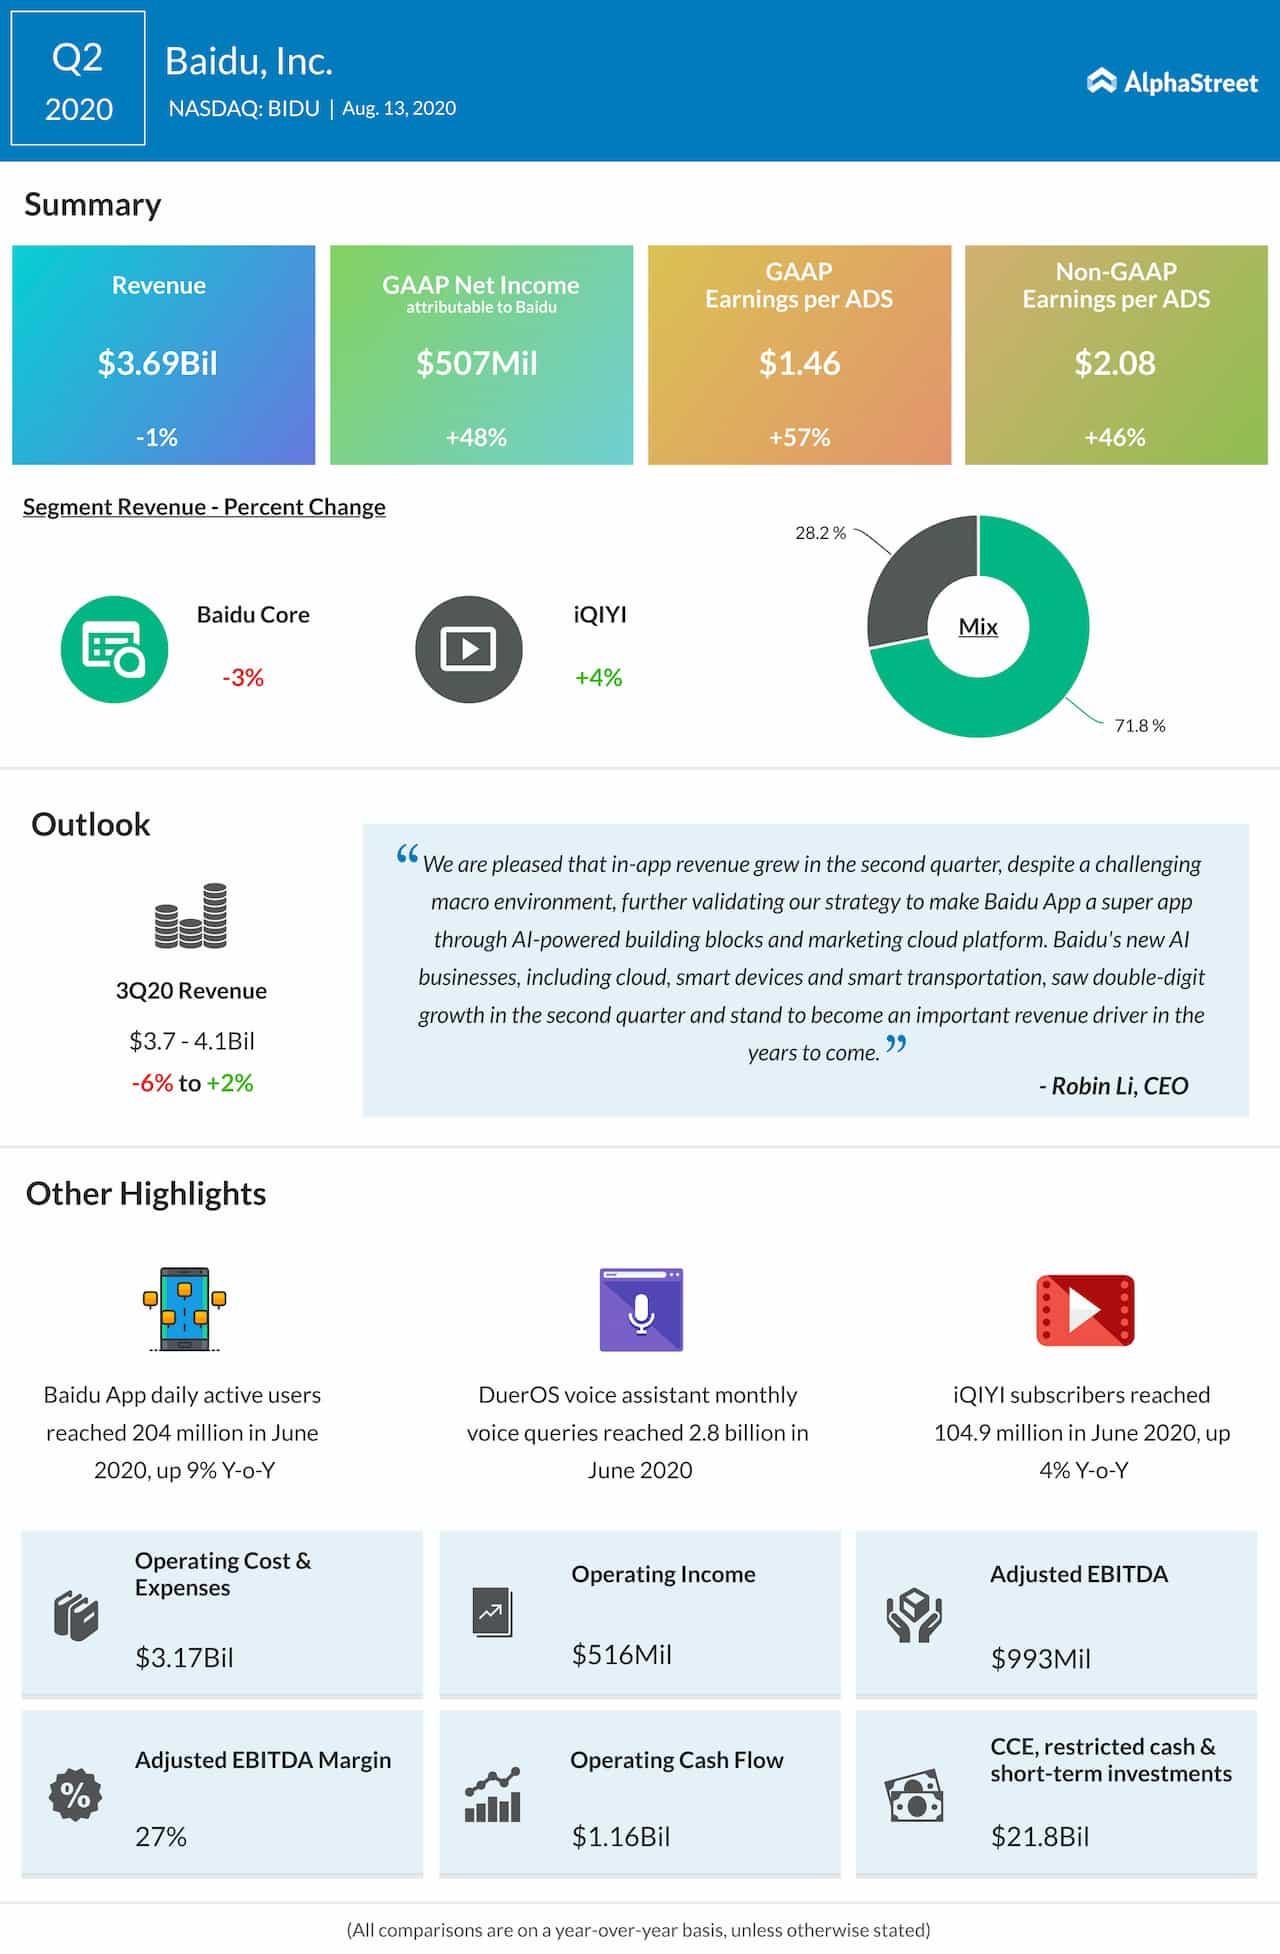 Baidu Q2 2020 Earnings Infographic